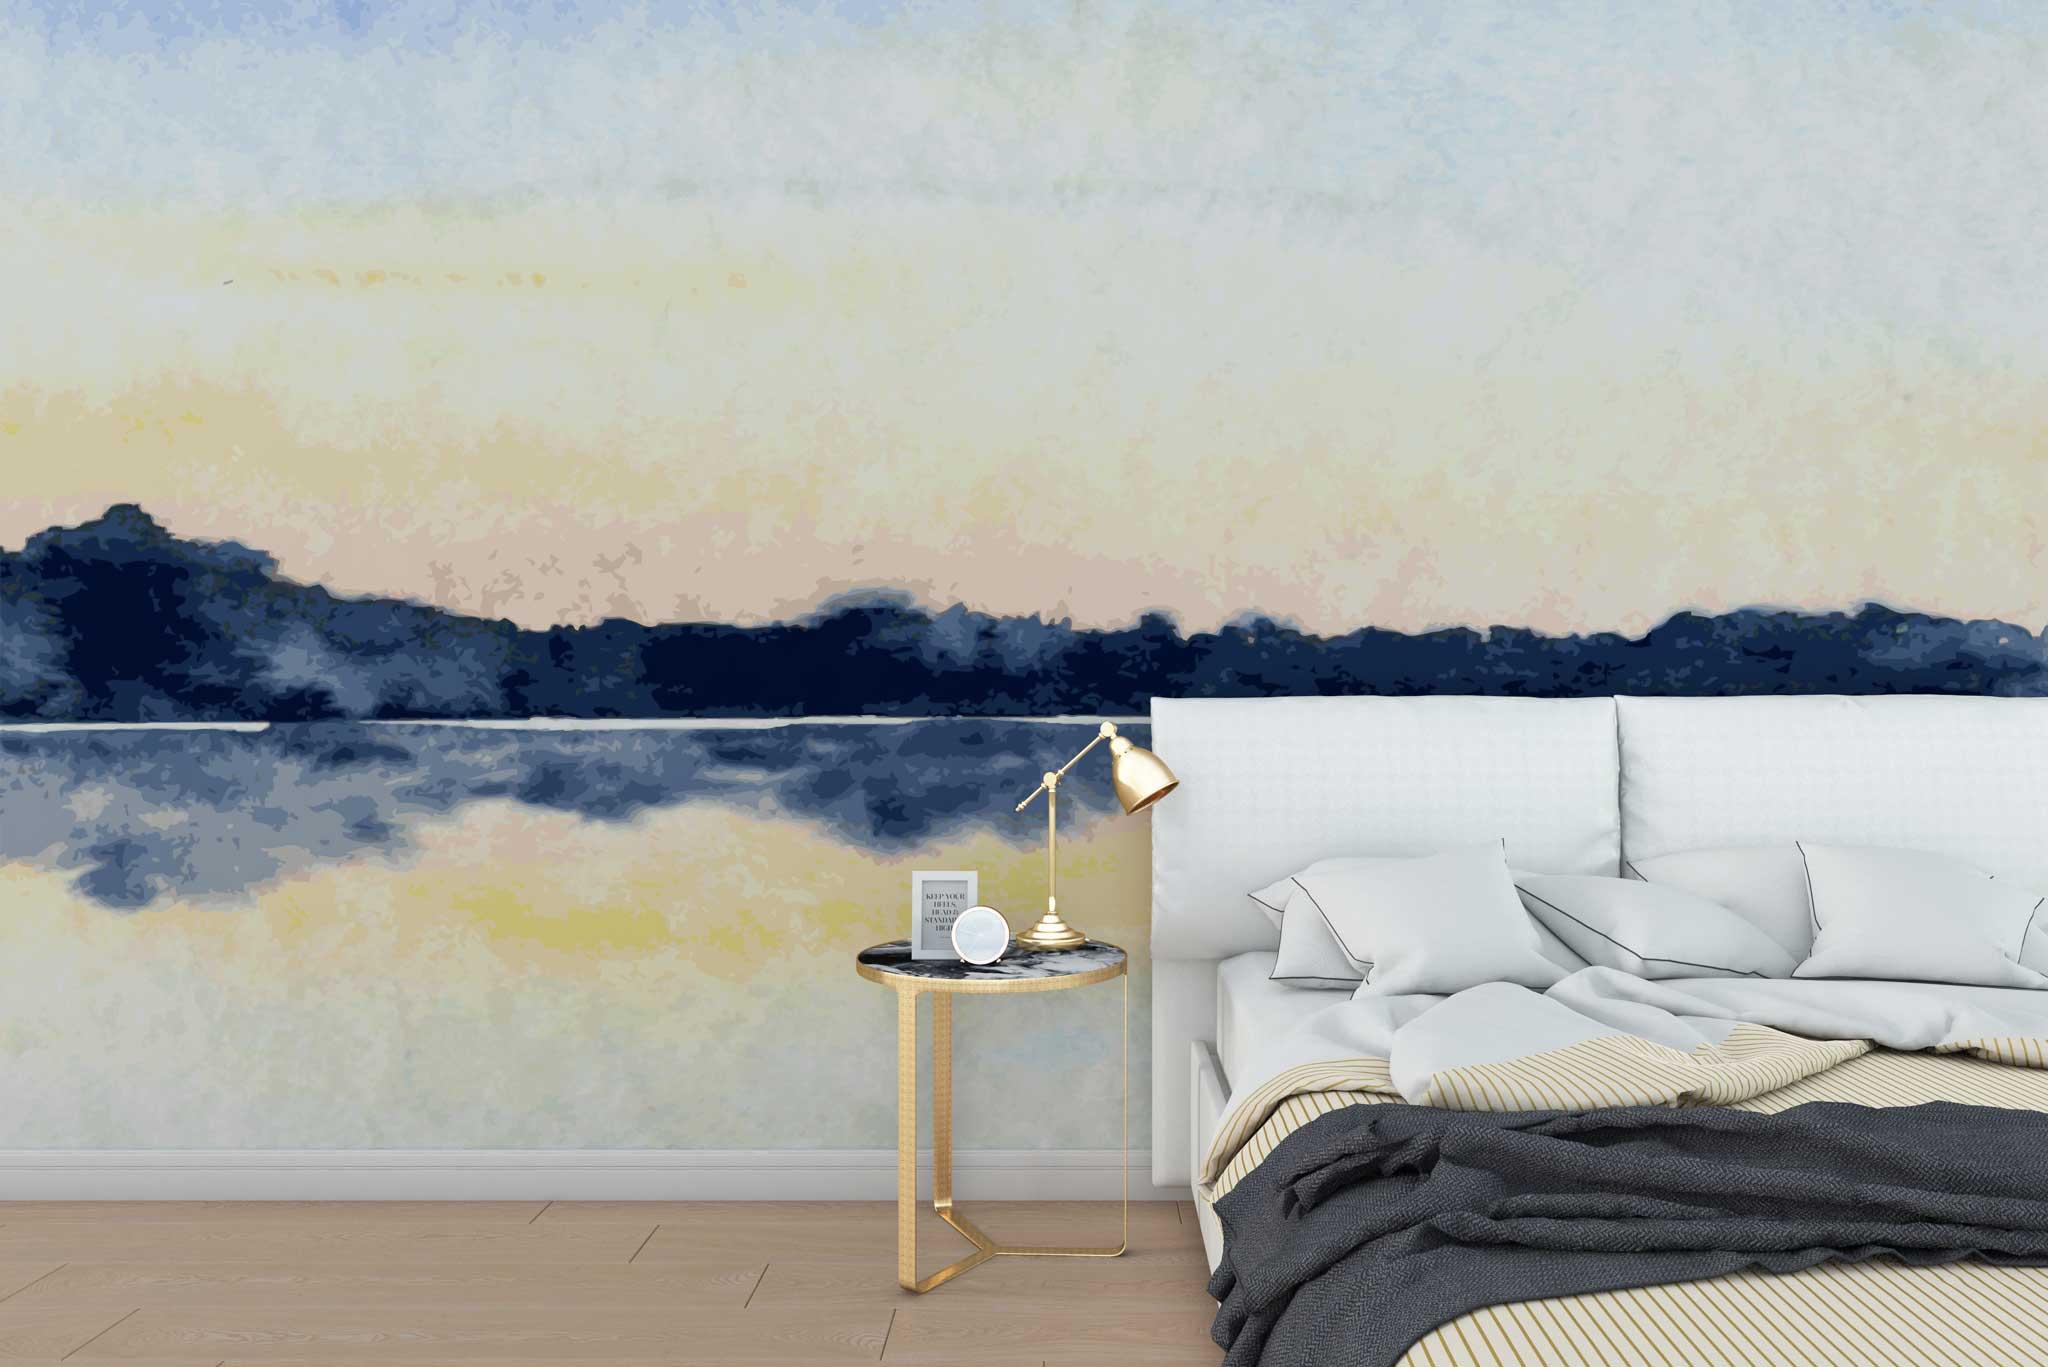 tapet-fototapet-special-personalizat-customizabil-comanda-bucuresti-daring-prints-model-desen-ilustratie-acuarela-peisaj-munte-apa-lac-bleumarin-pastel